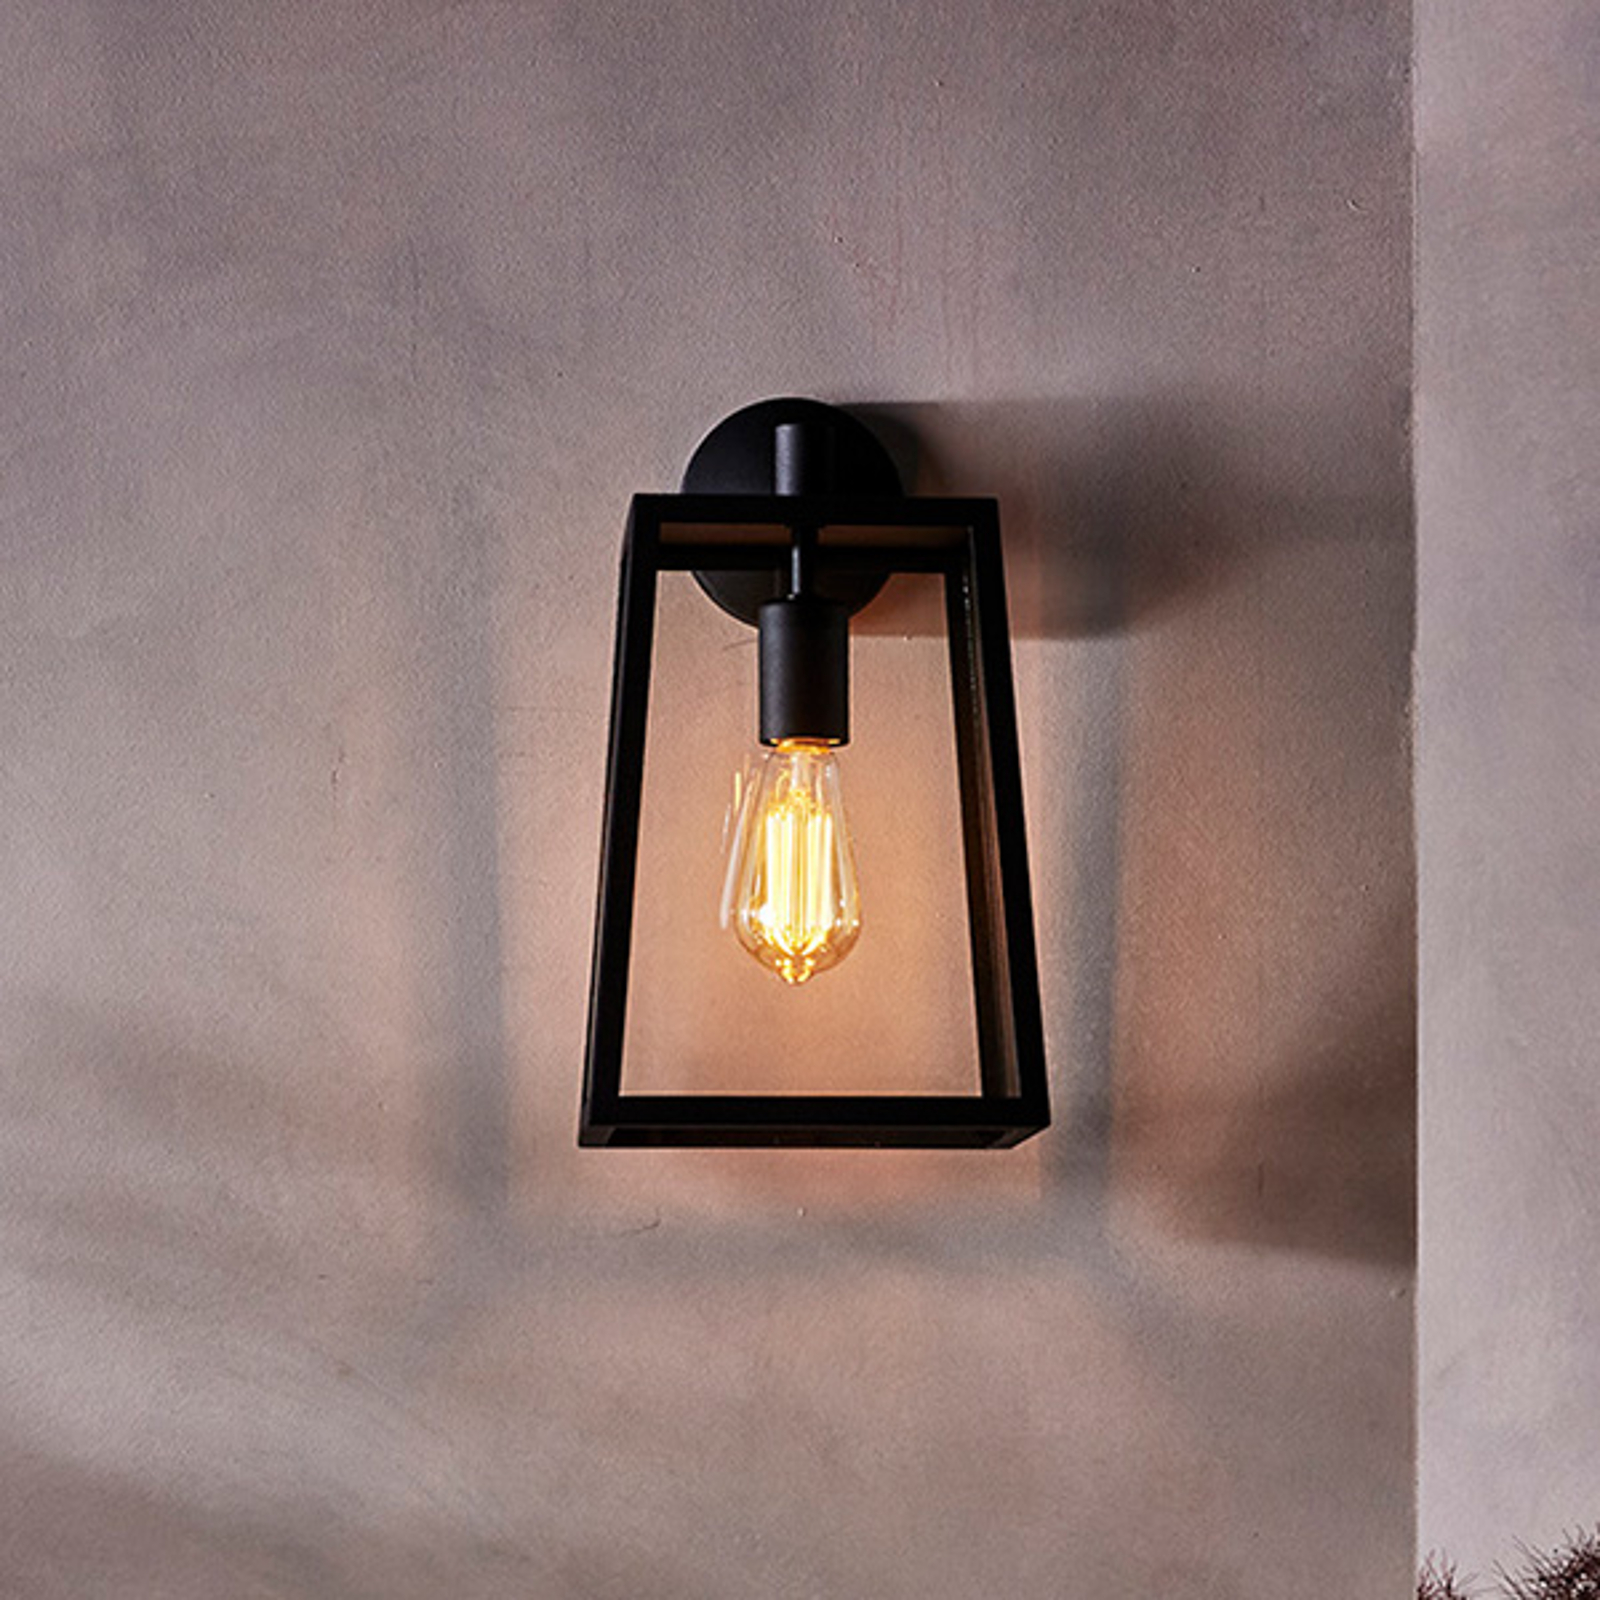 Astro Calvi - buitenwandlamp, 38,5 cm, zwart